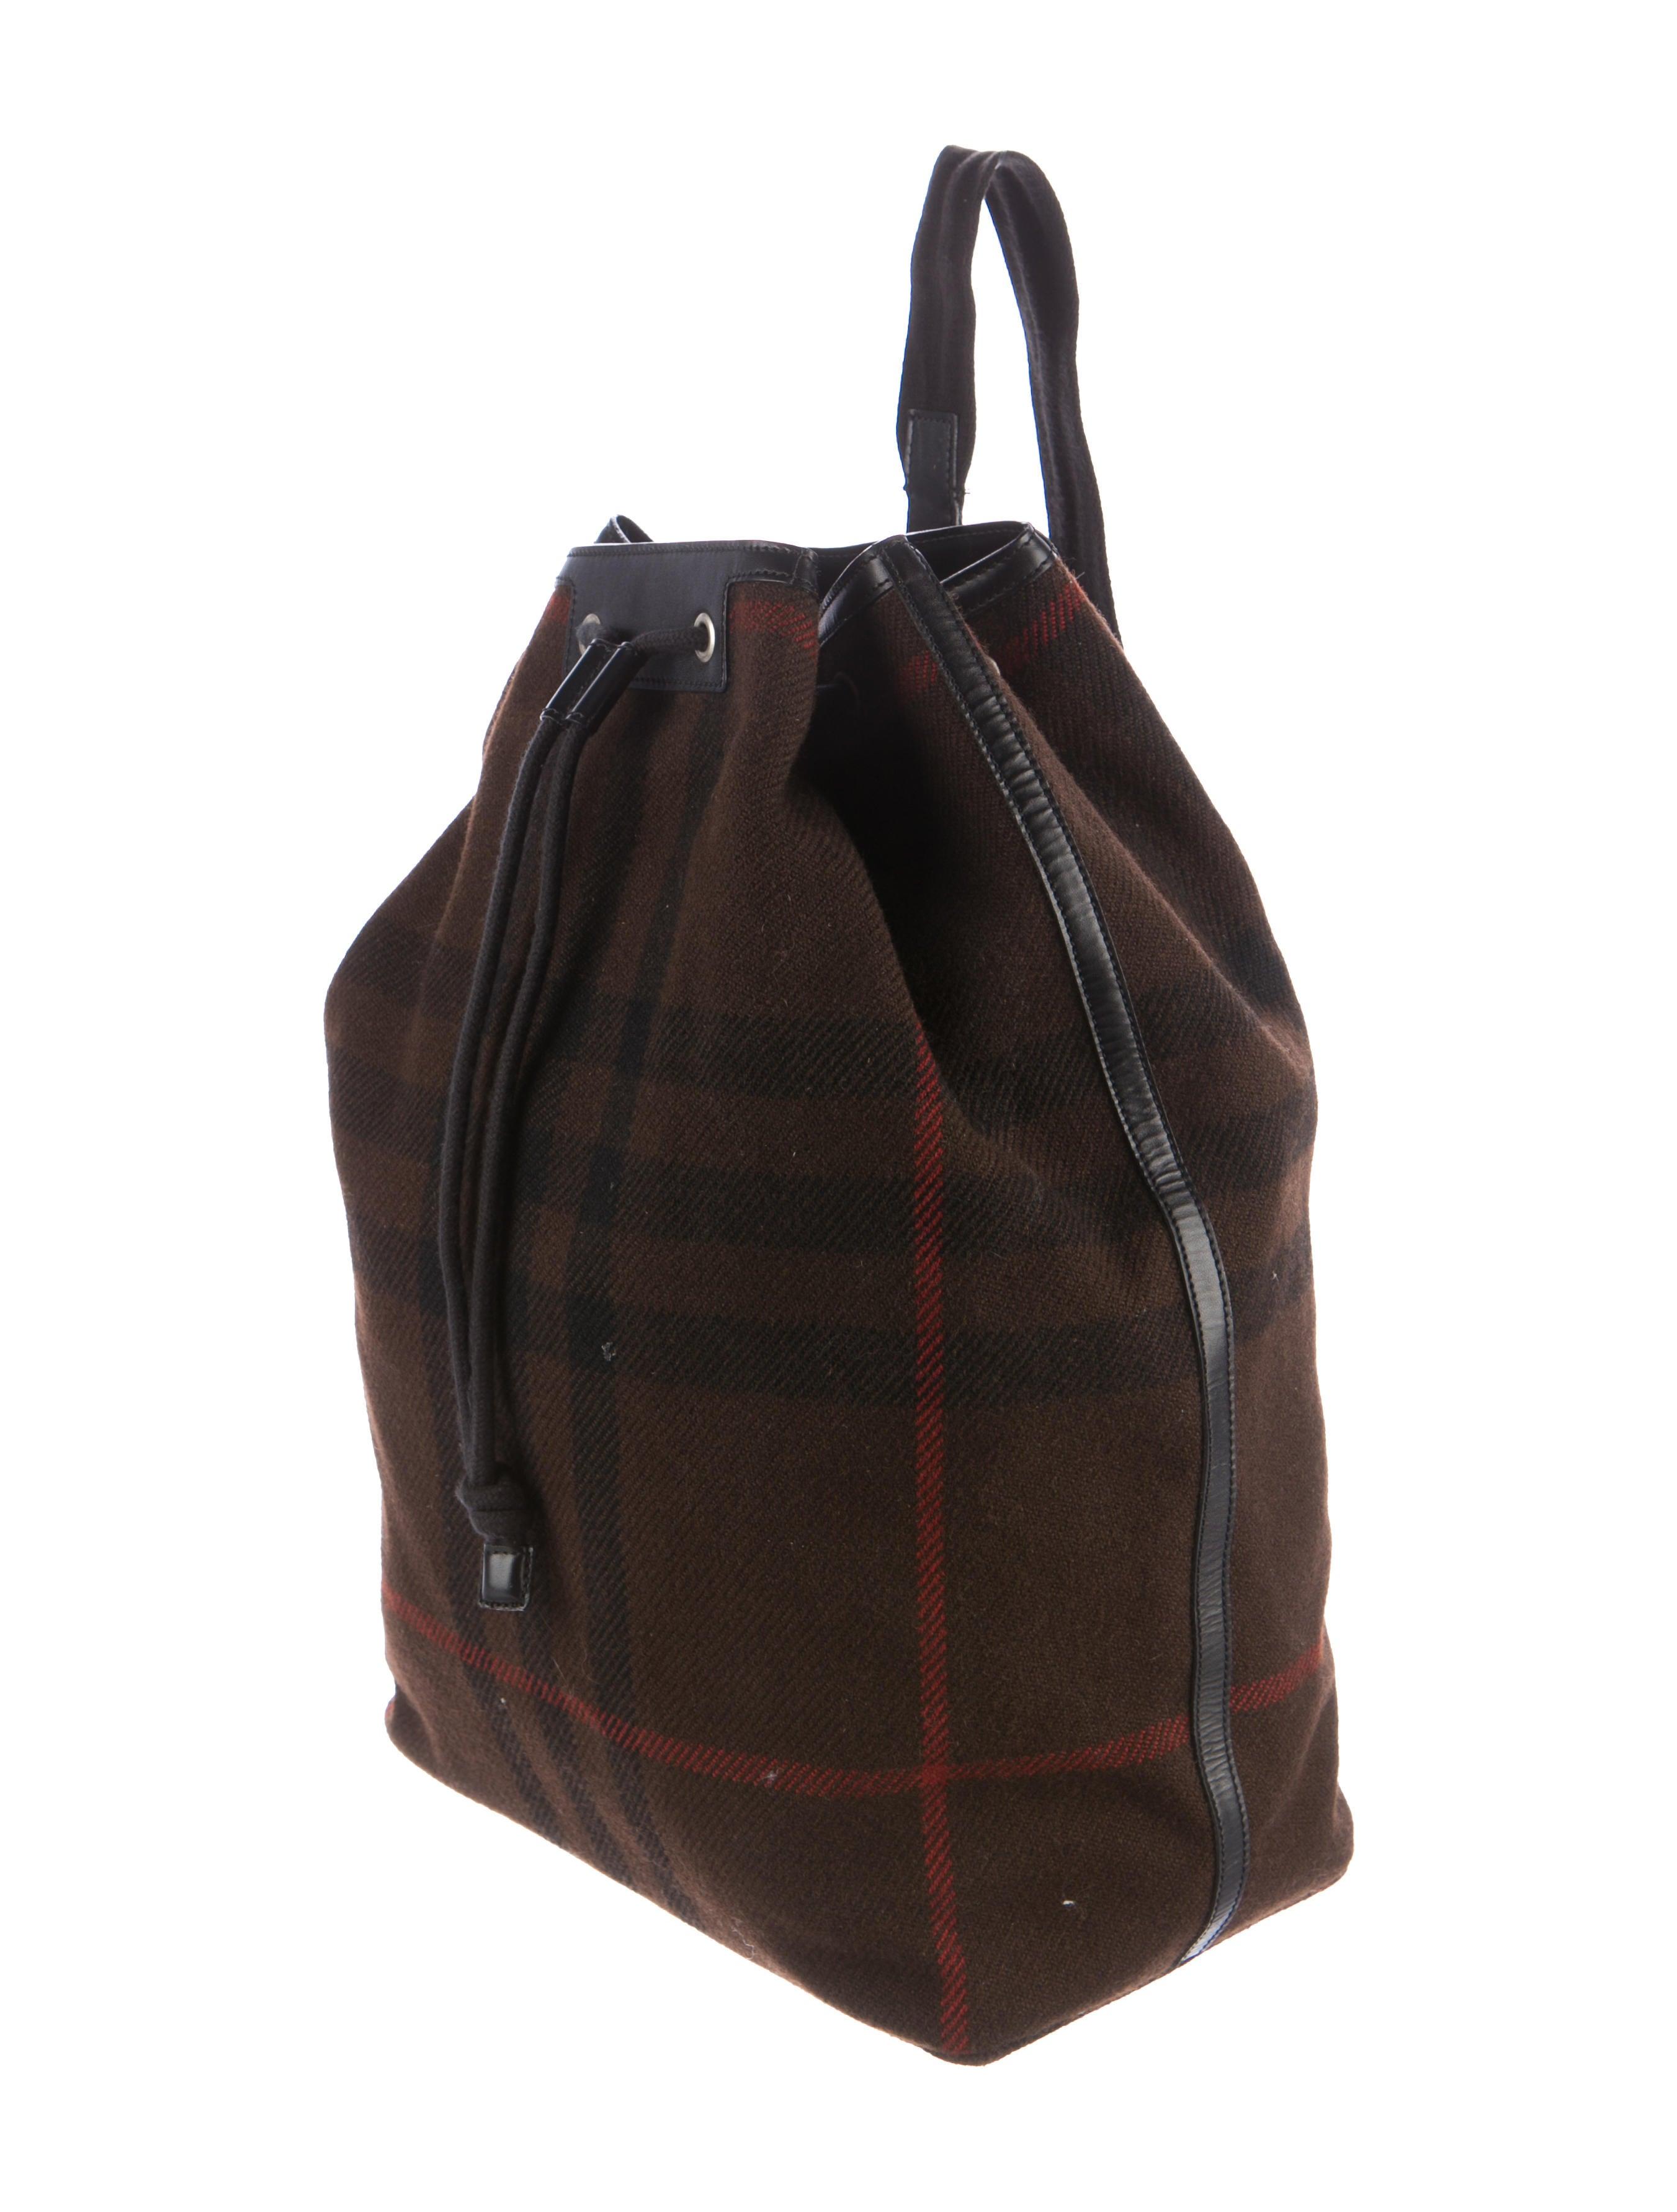 Burberry Wool Nova Check Backpack - Bags - BUR74930 | The ...